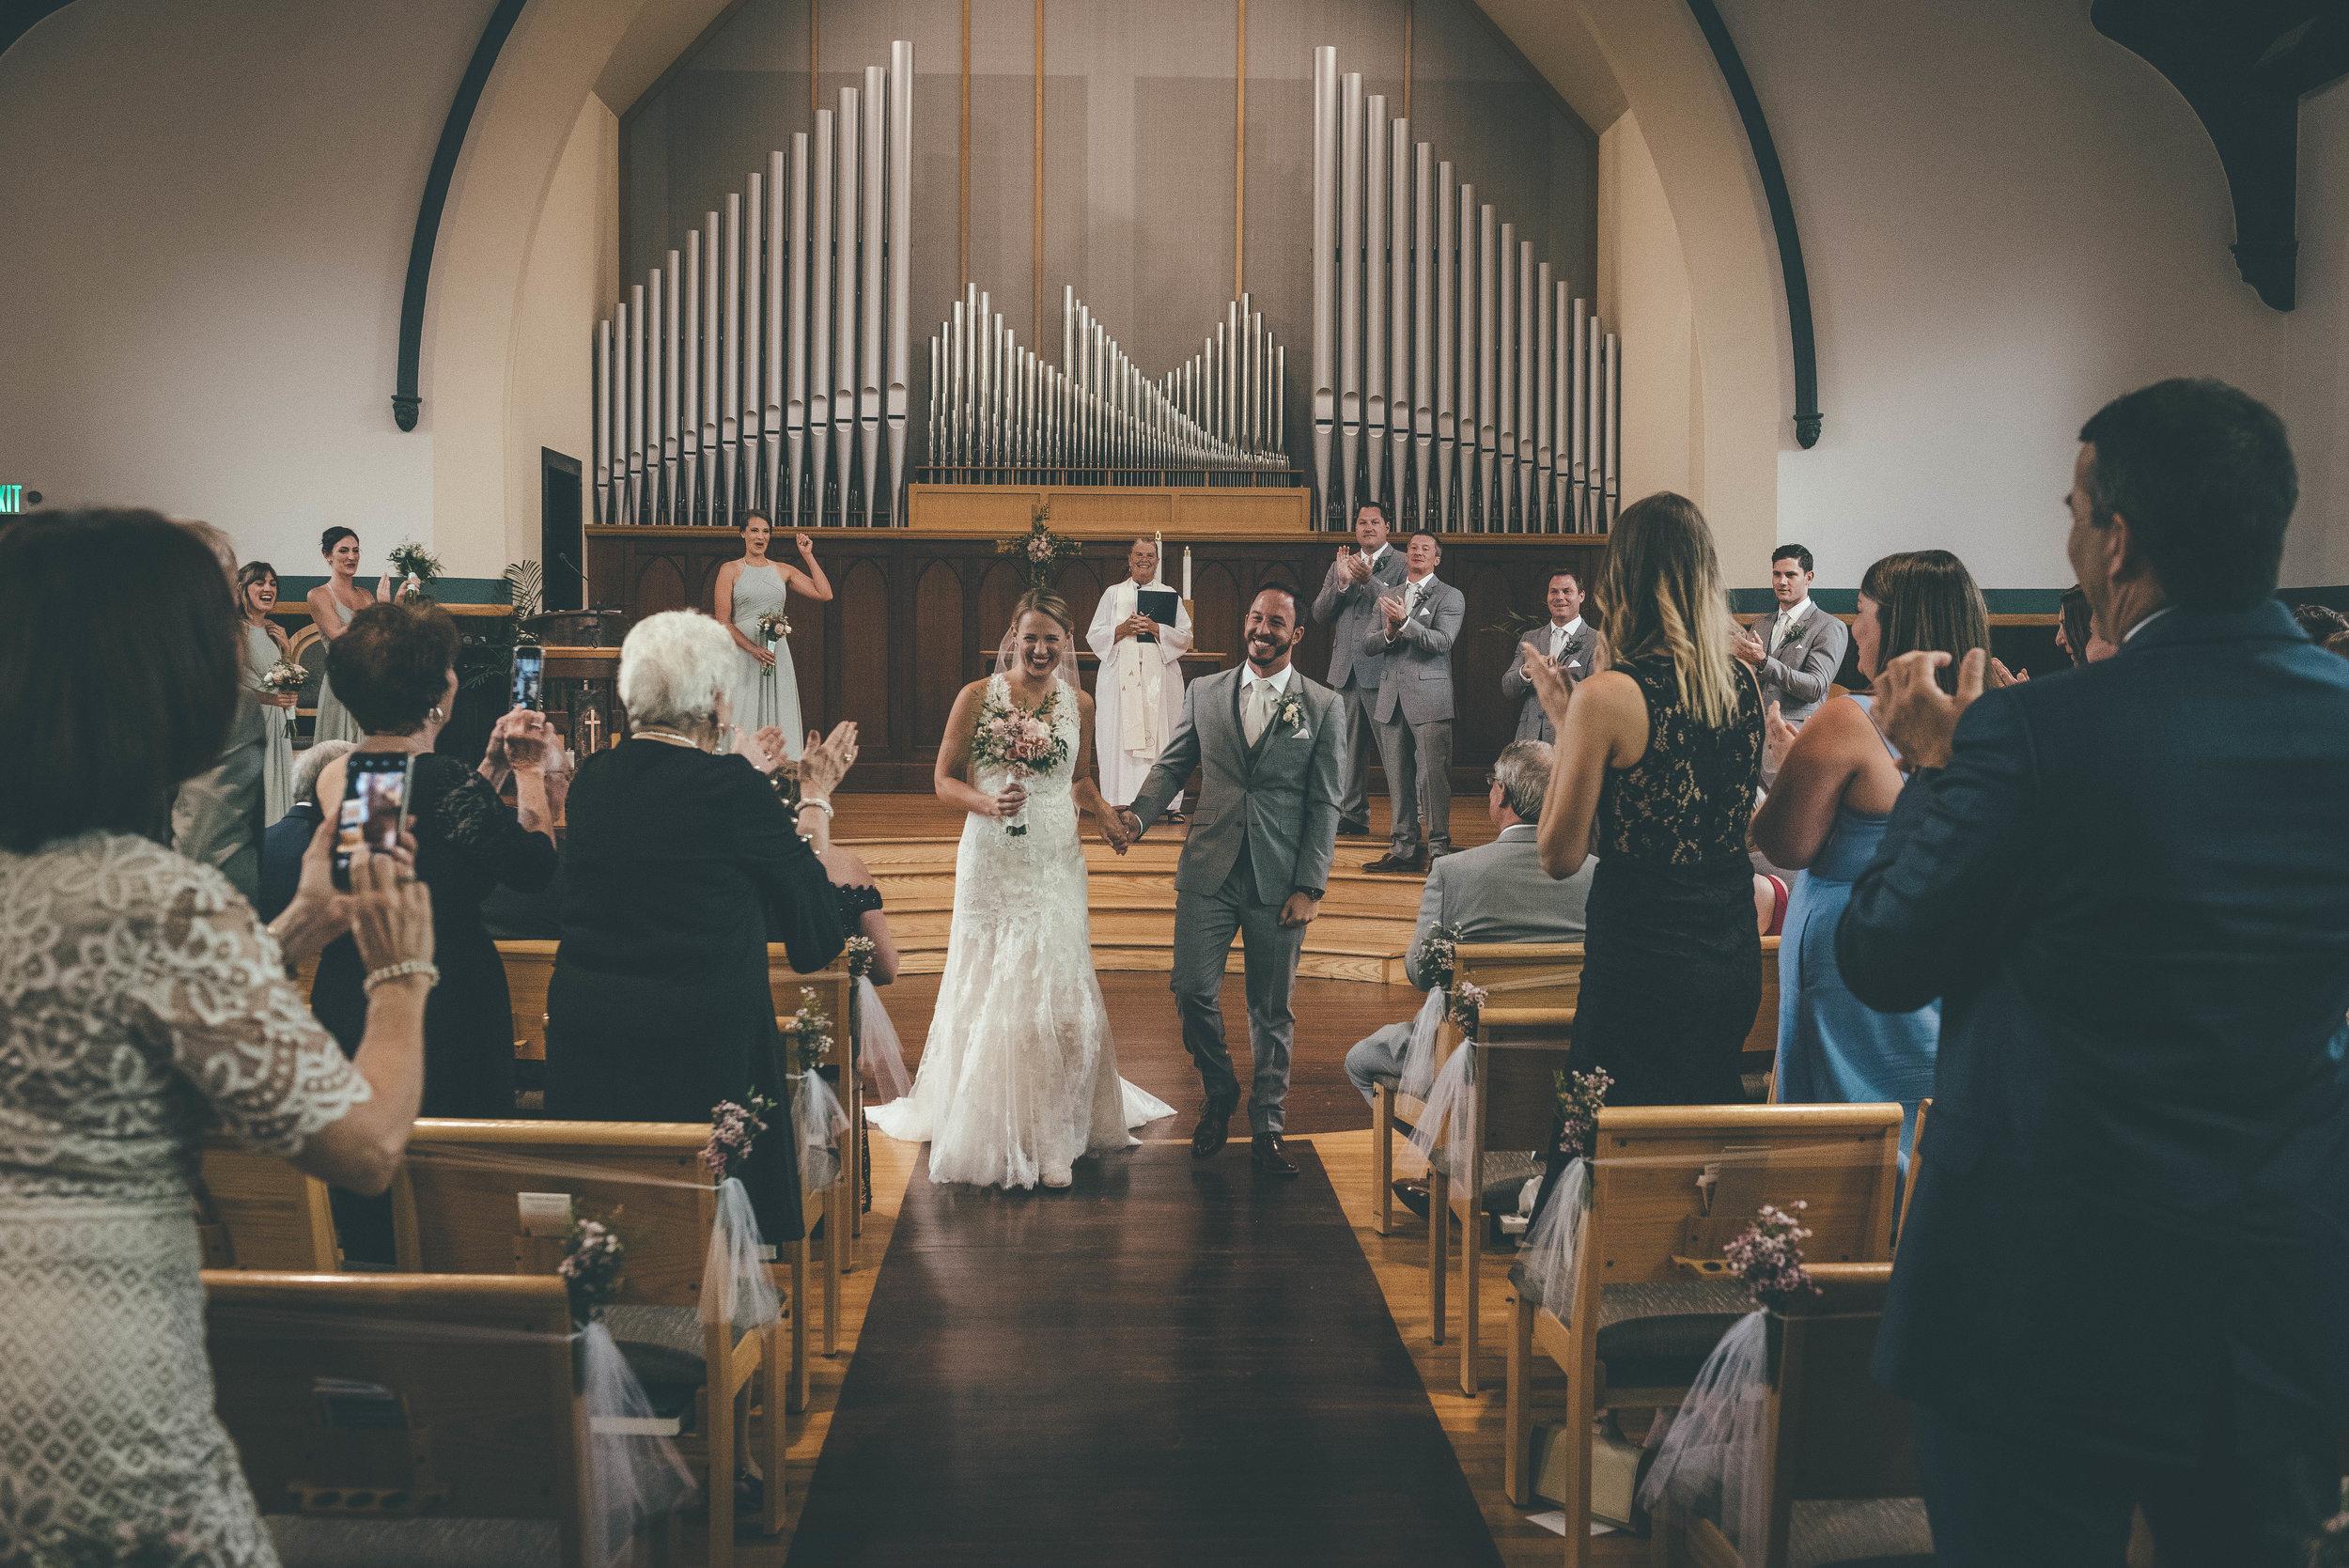 ChadFahnestockPhotography-mc-wedding-015.jpg